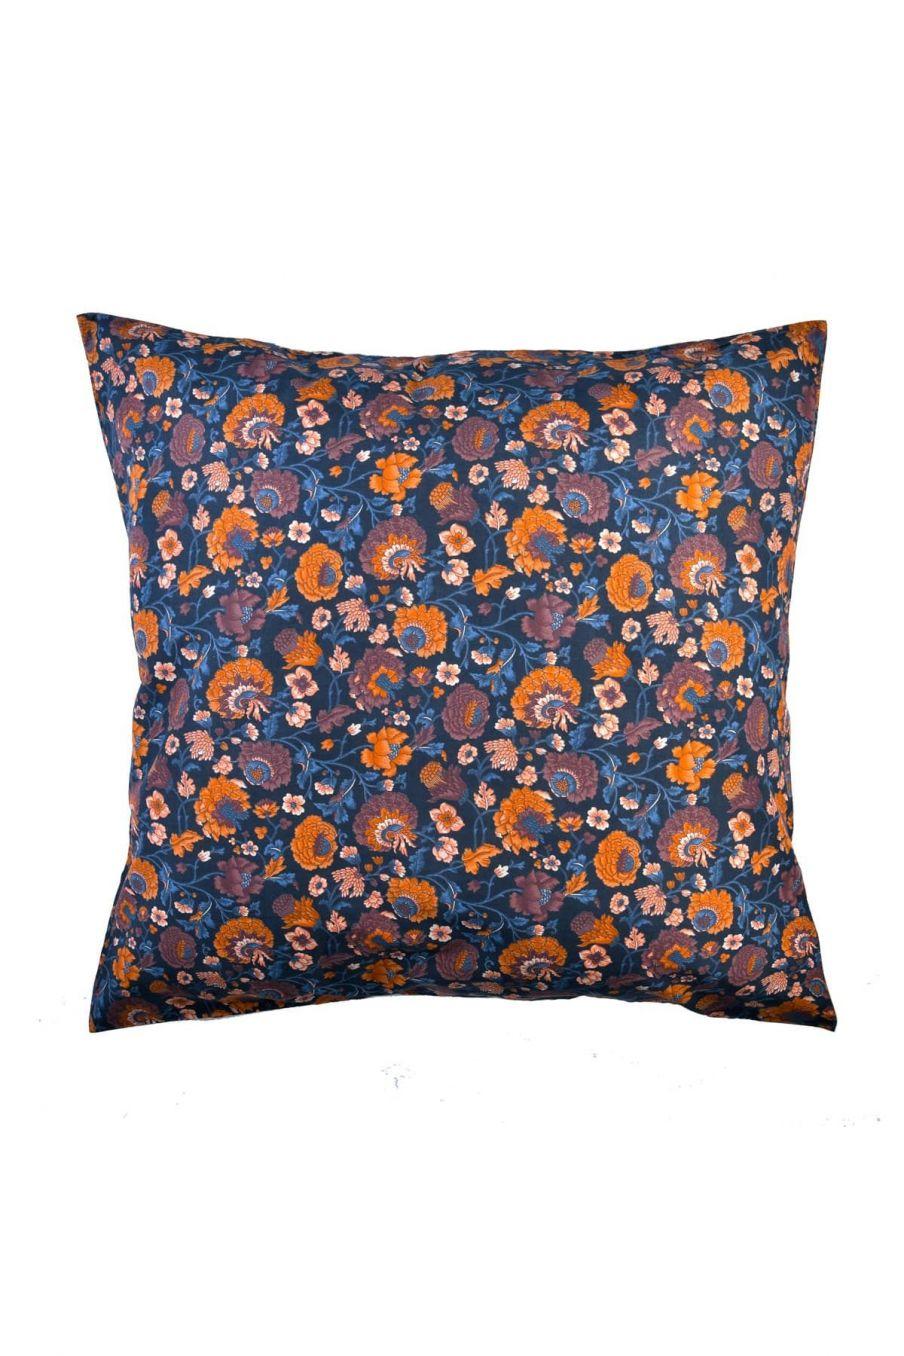 taie d'oreiller maison valerie charcoal bohemian flowers - louise misha